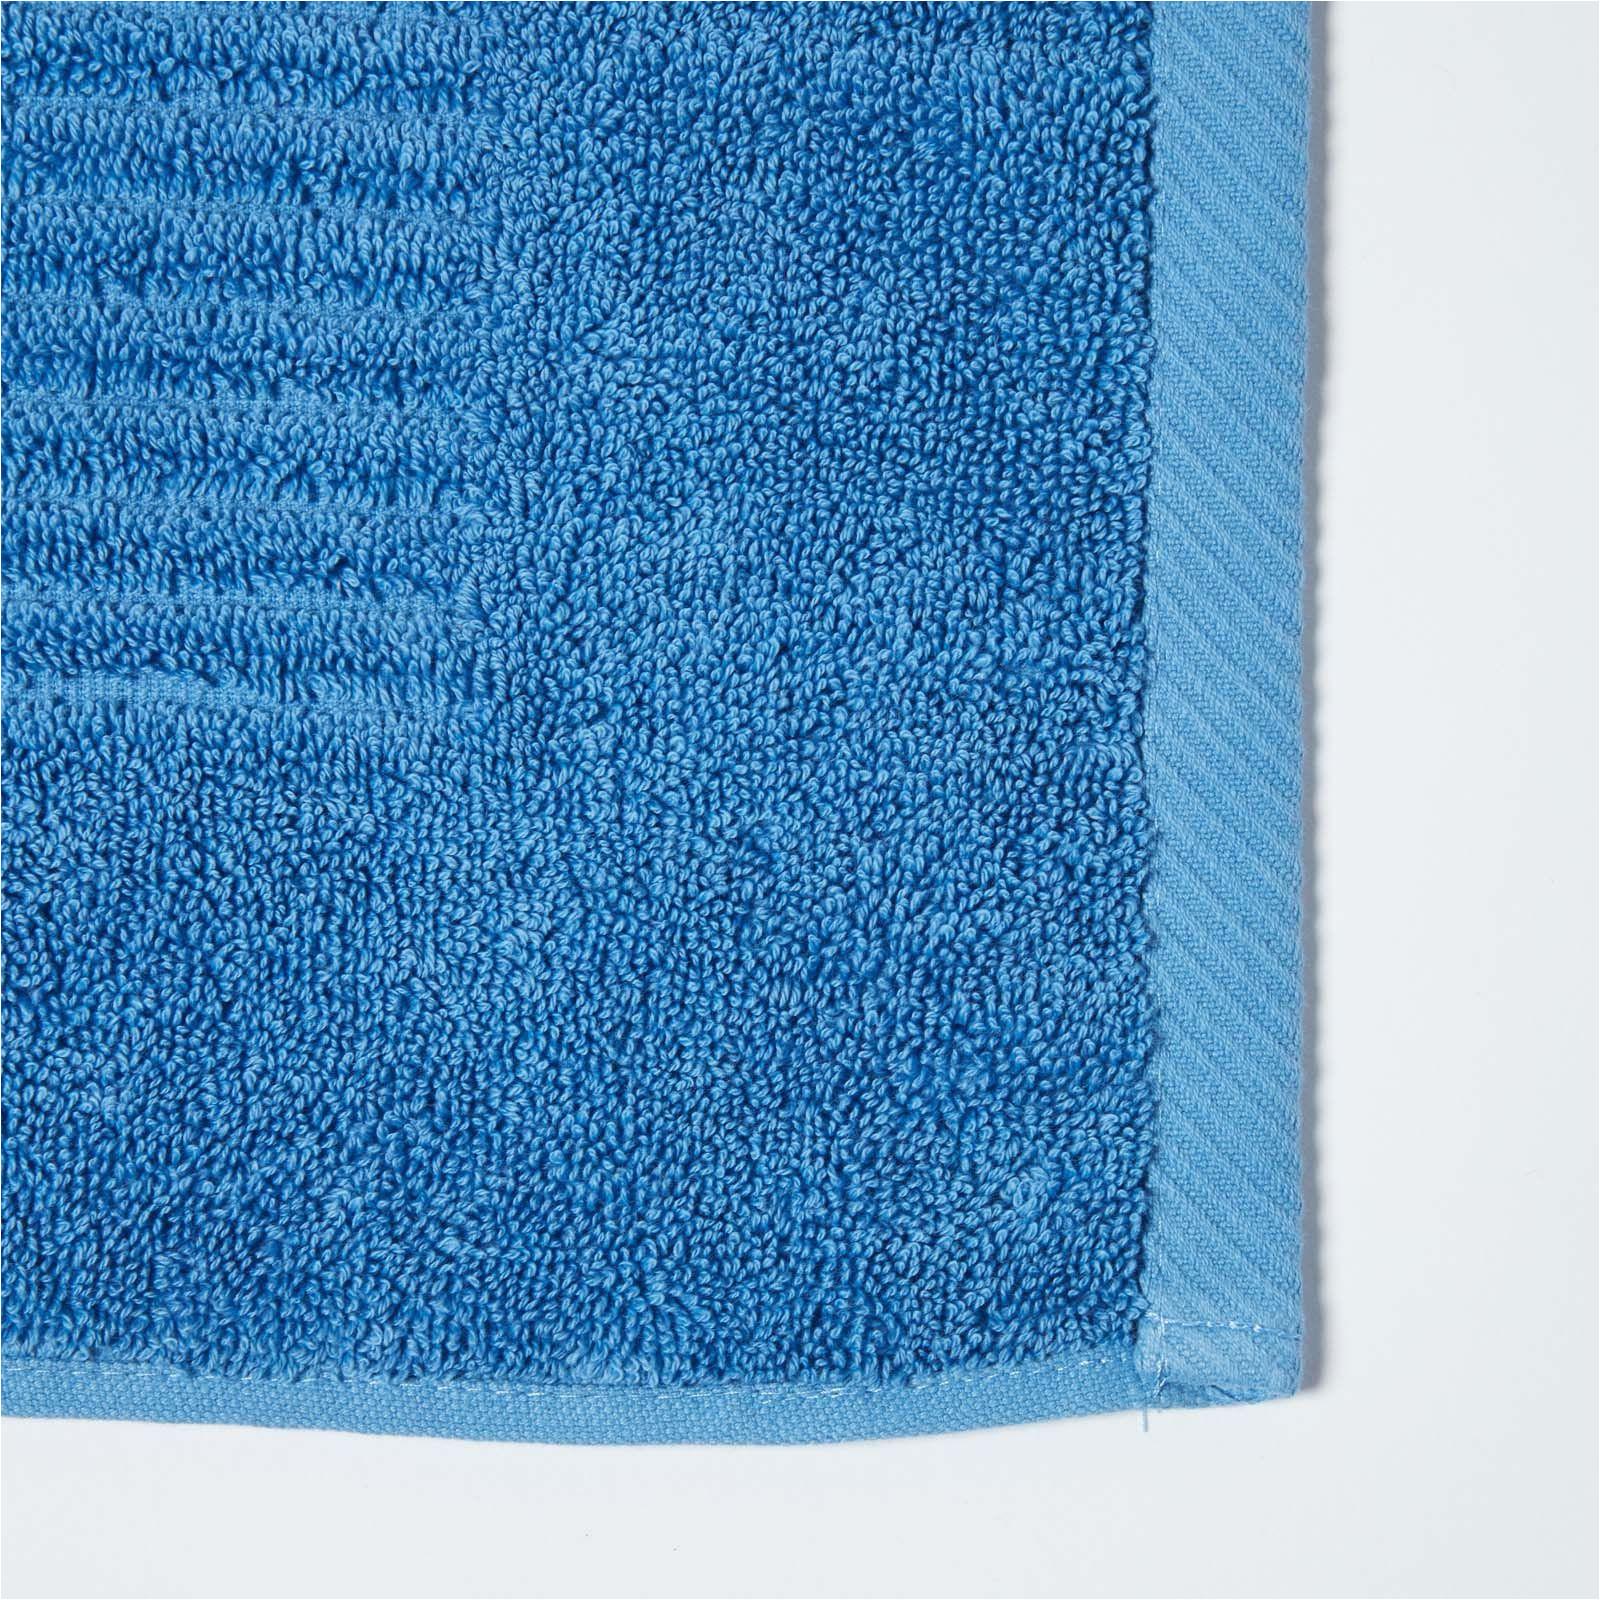 imperial plain bath mat cobalt blue